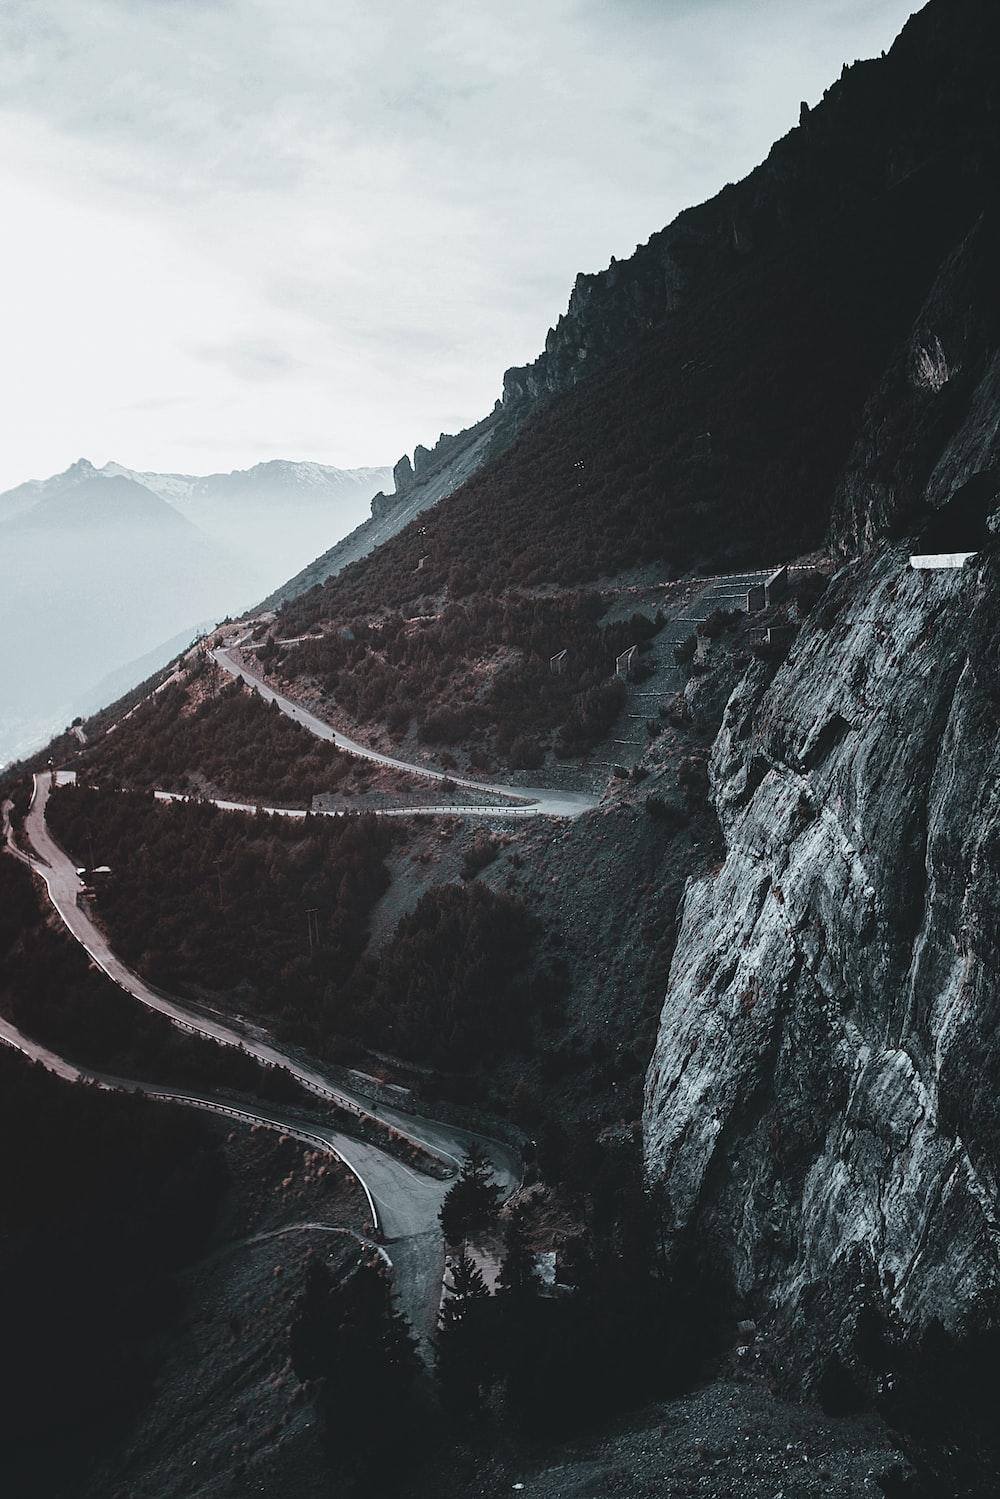 landscape photography of zig zag road on mountain